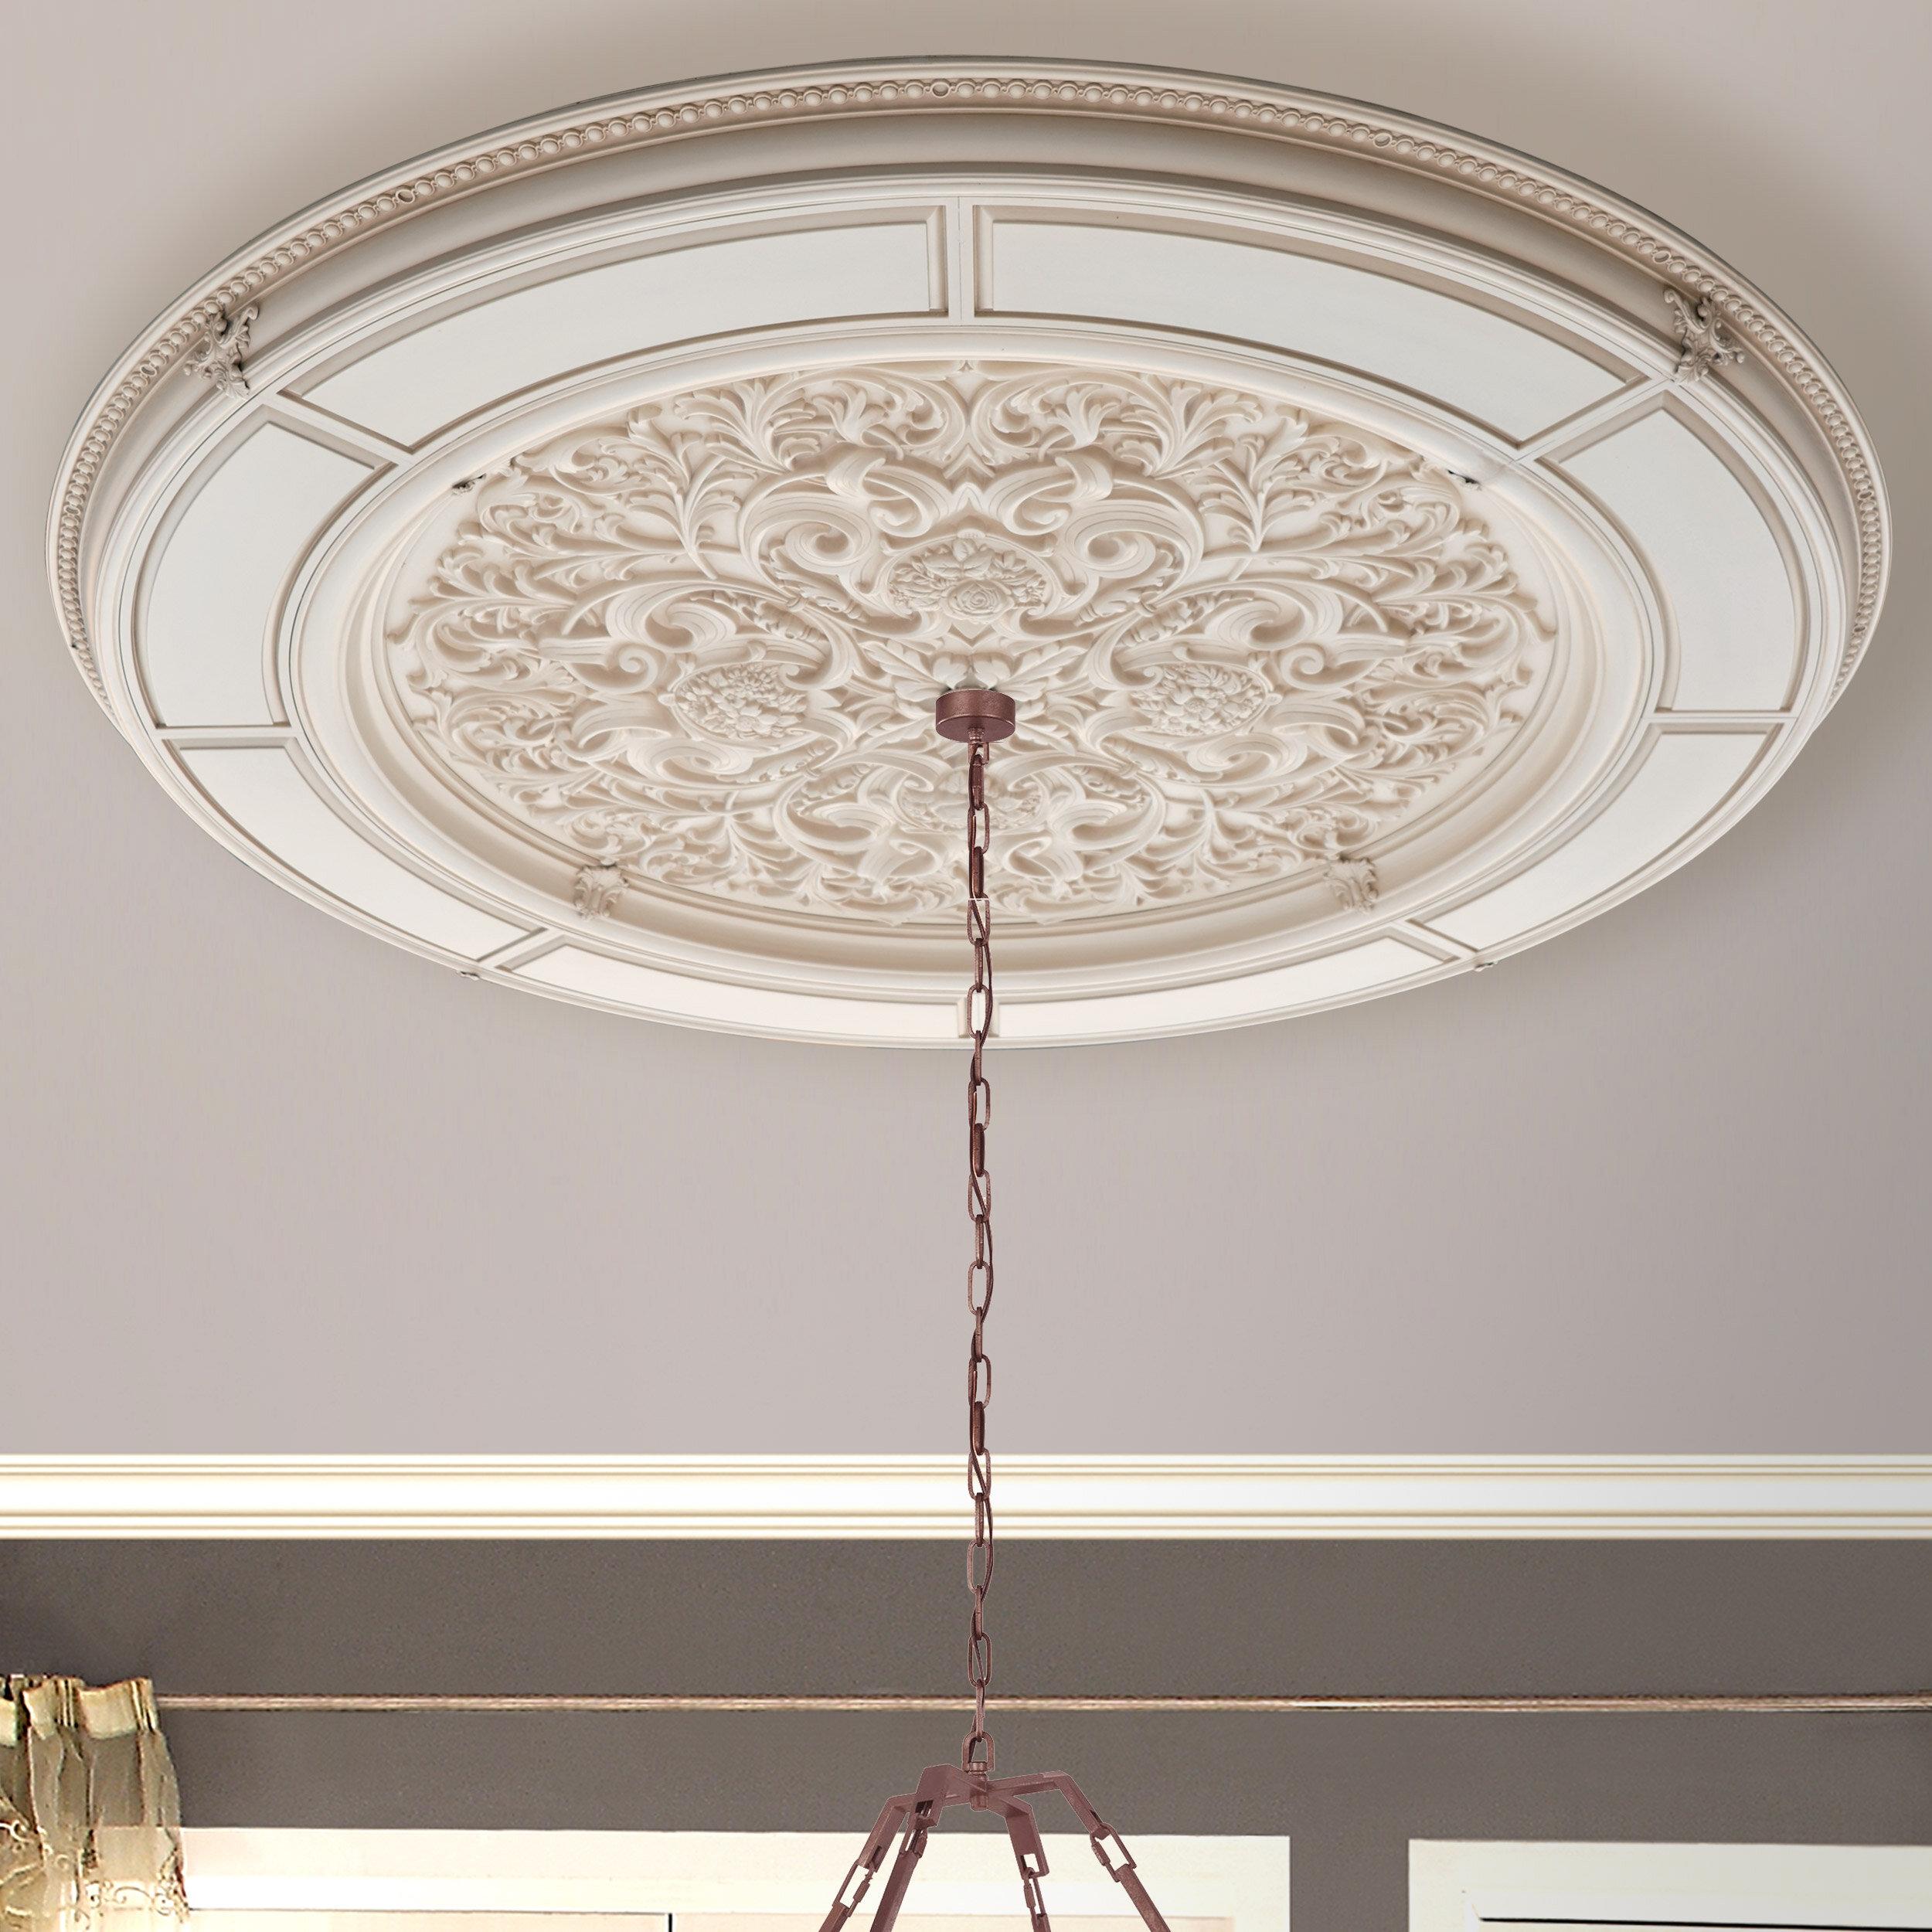 Art Frame Direct Alluring Carve Cream Round Ceiling Medallion Wayfair